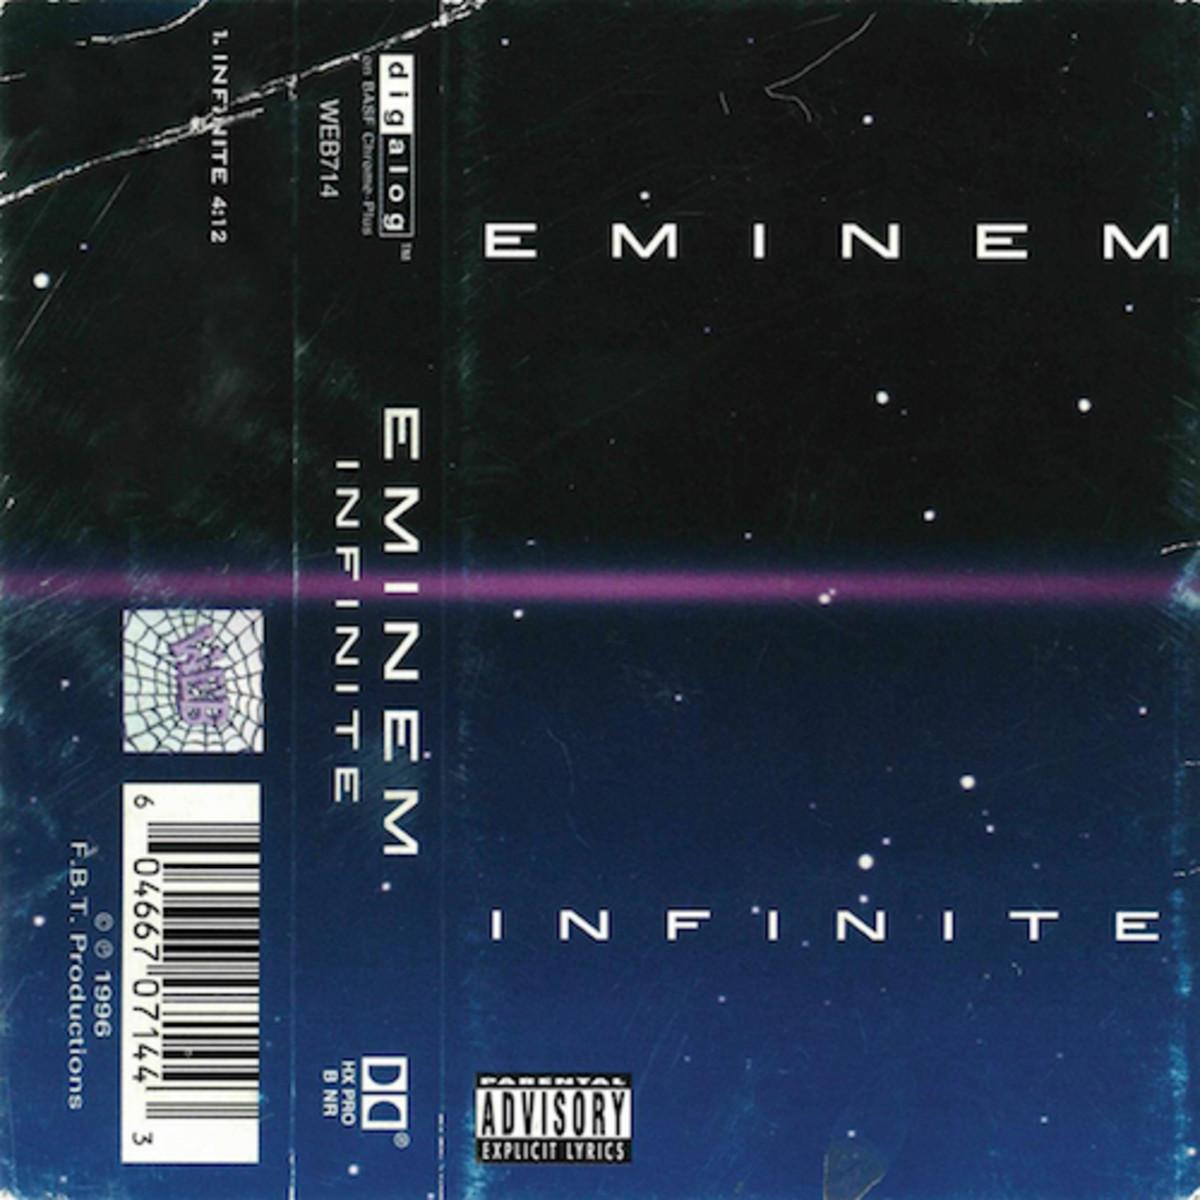 eminem-infinite-fbt-remix.jpg